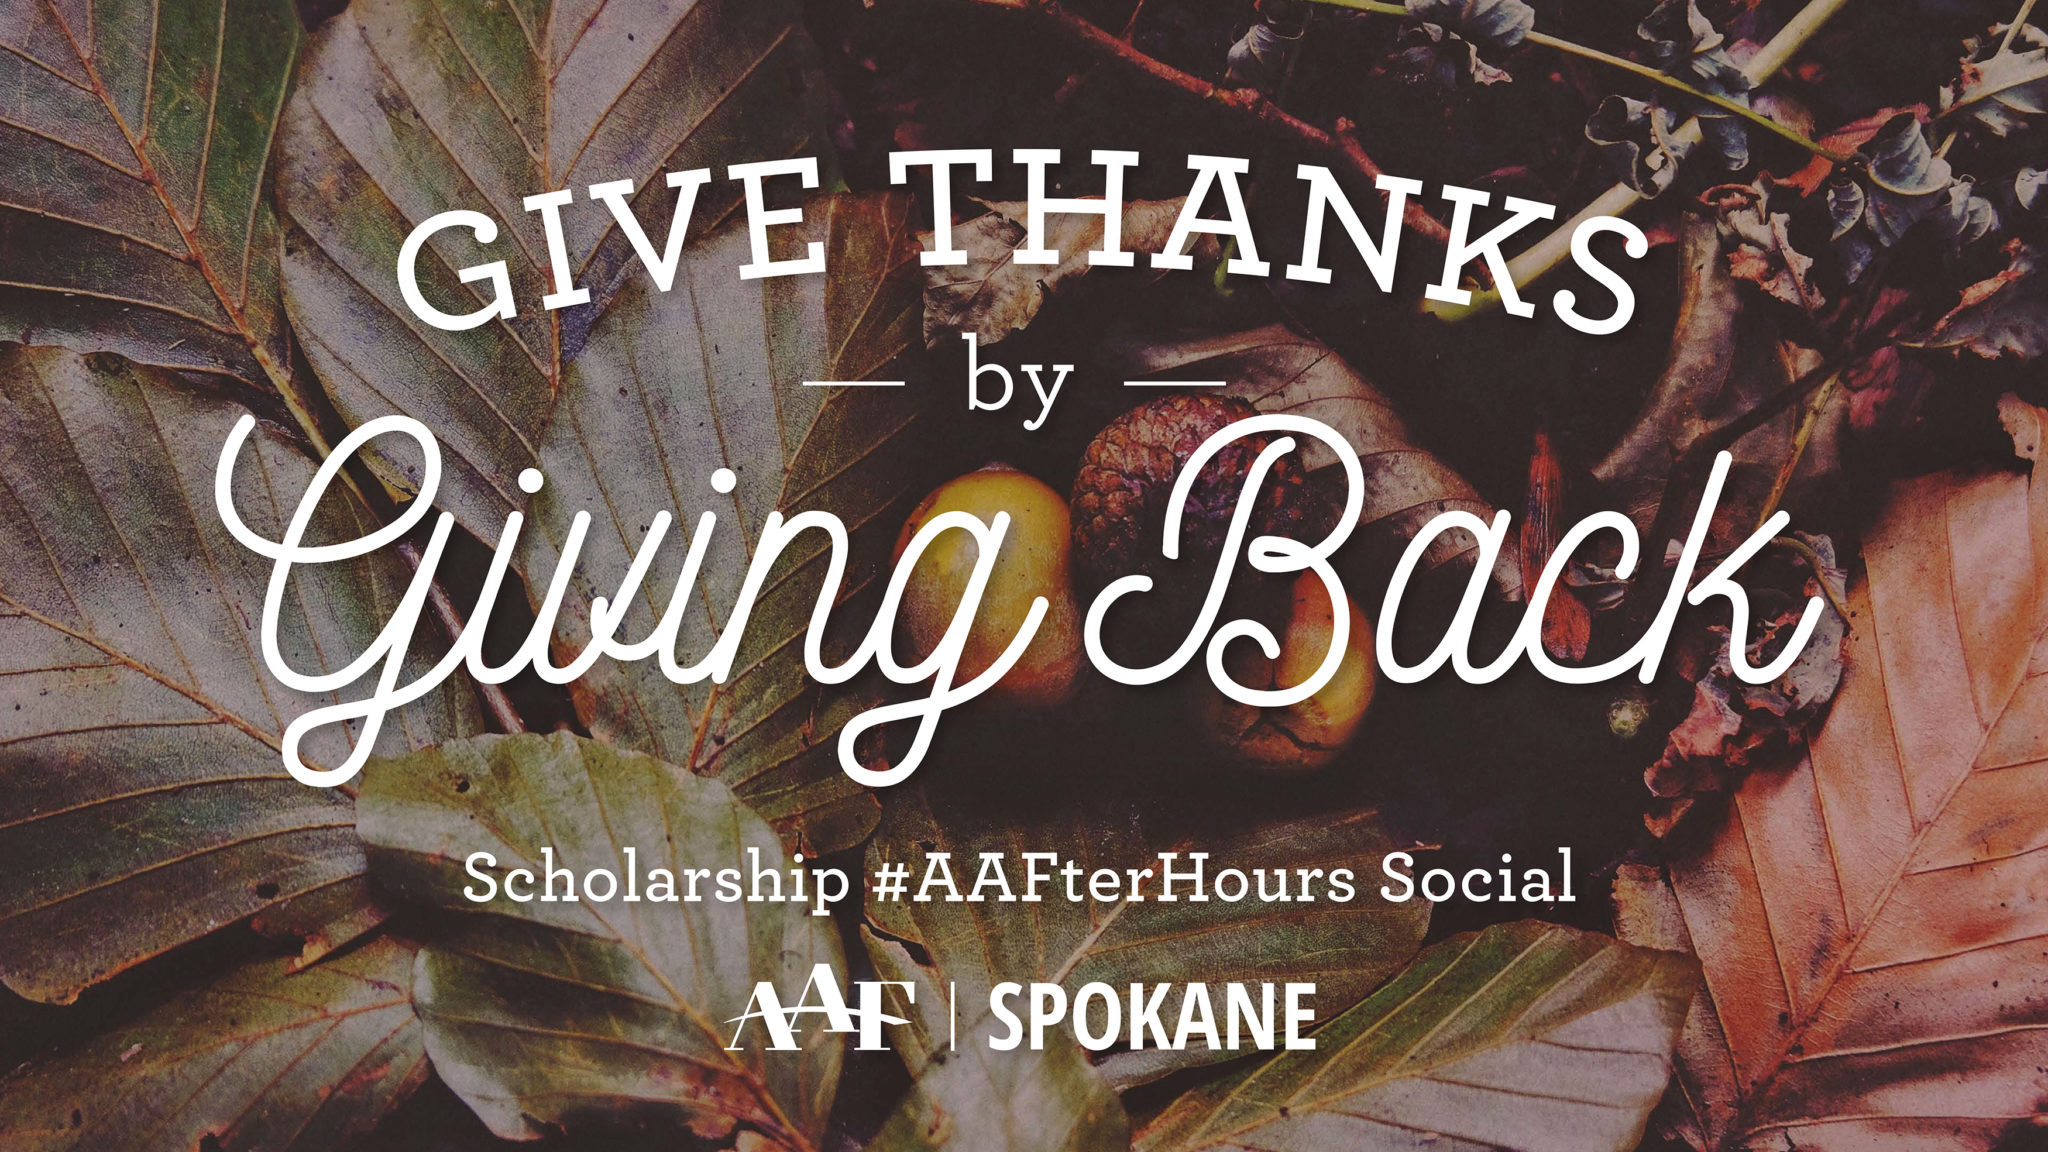 #AAFterHours Scholarship Social